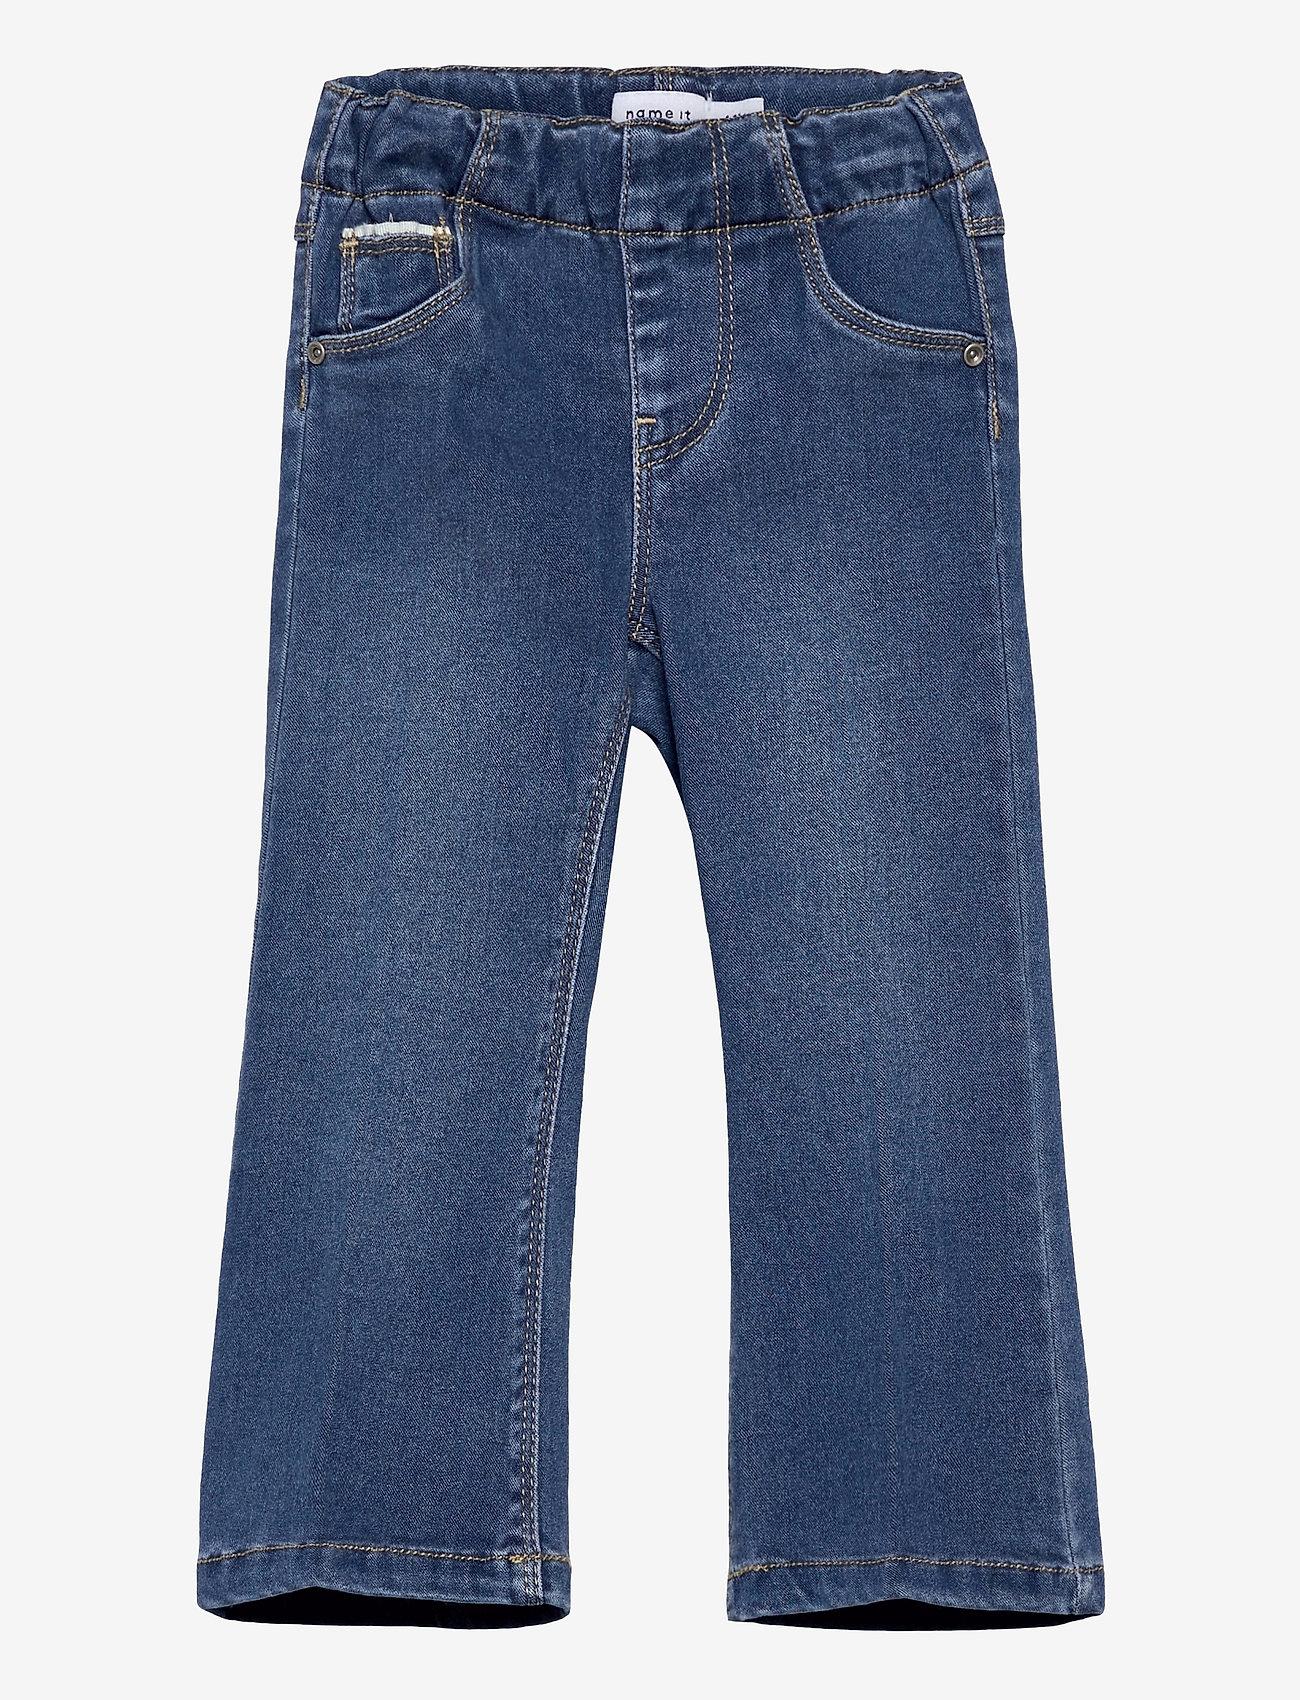 name it - NMFPOLLY DNMATORAS 2467 BOOT LEGGING - jeans - medium blue denim - 0